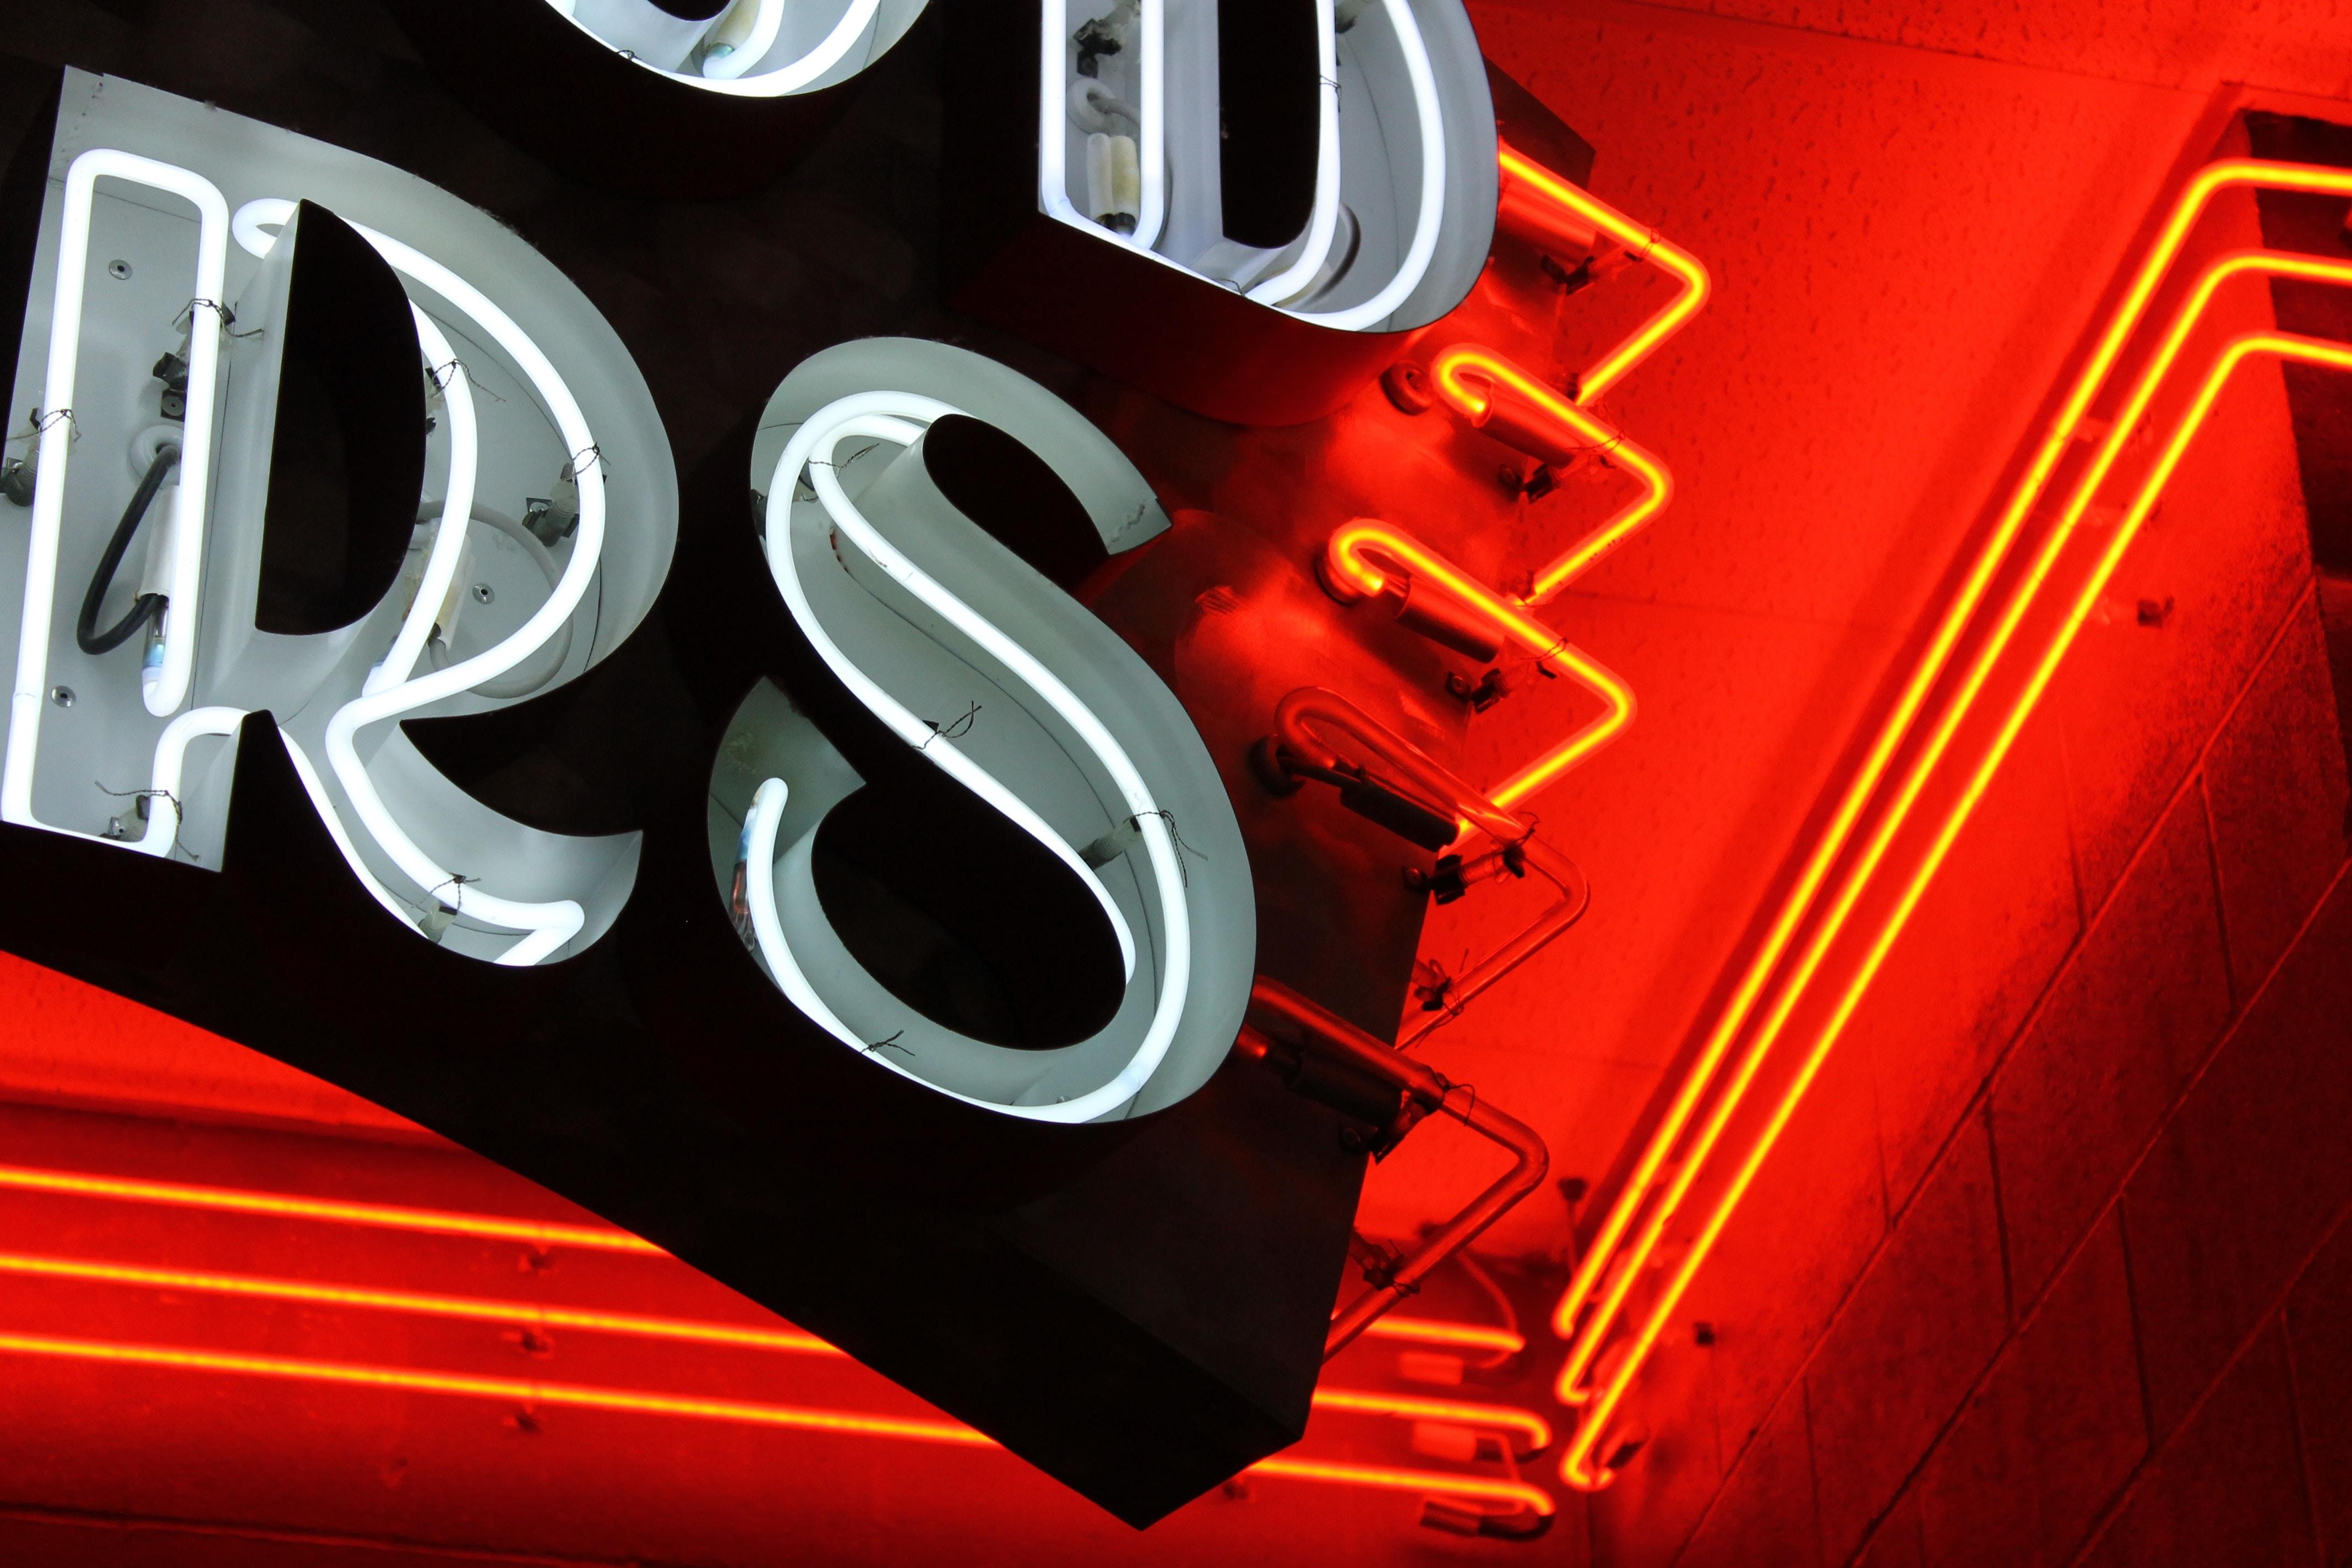 Details of lettering on vintage neon sign glowing orange